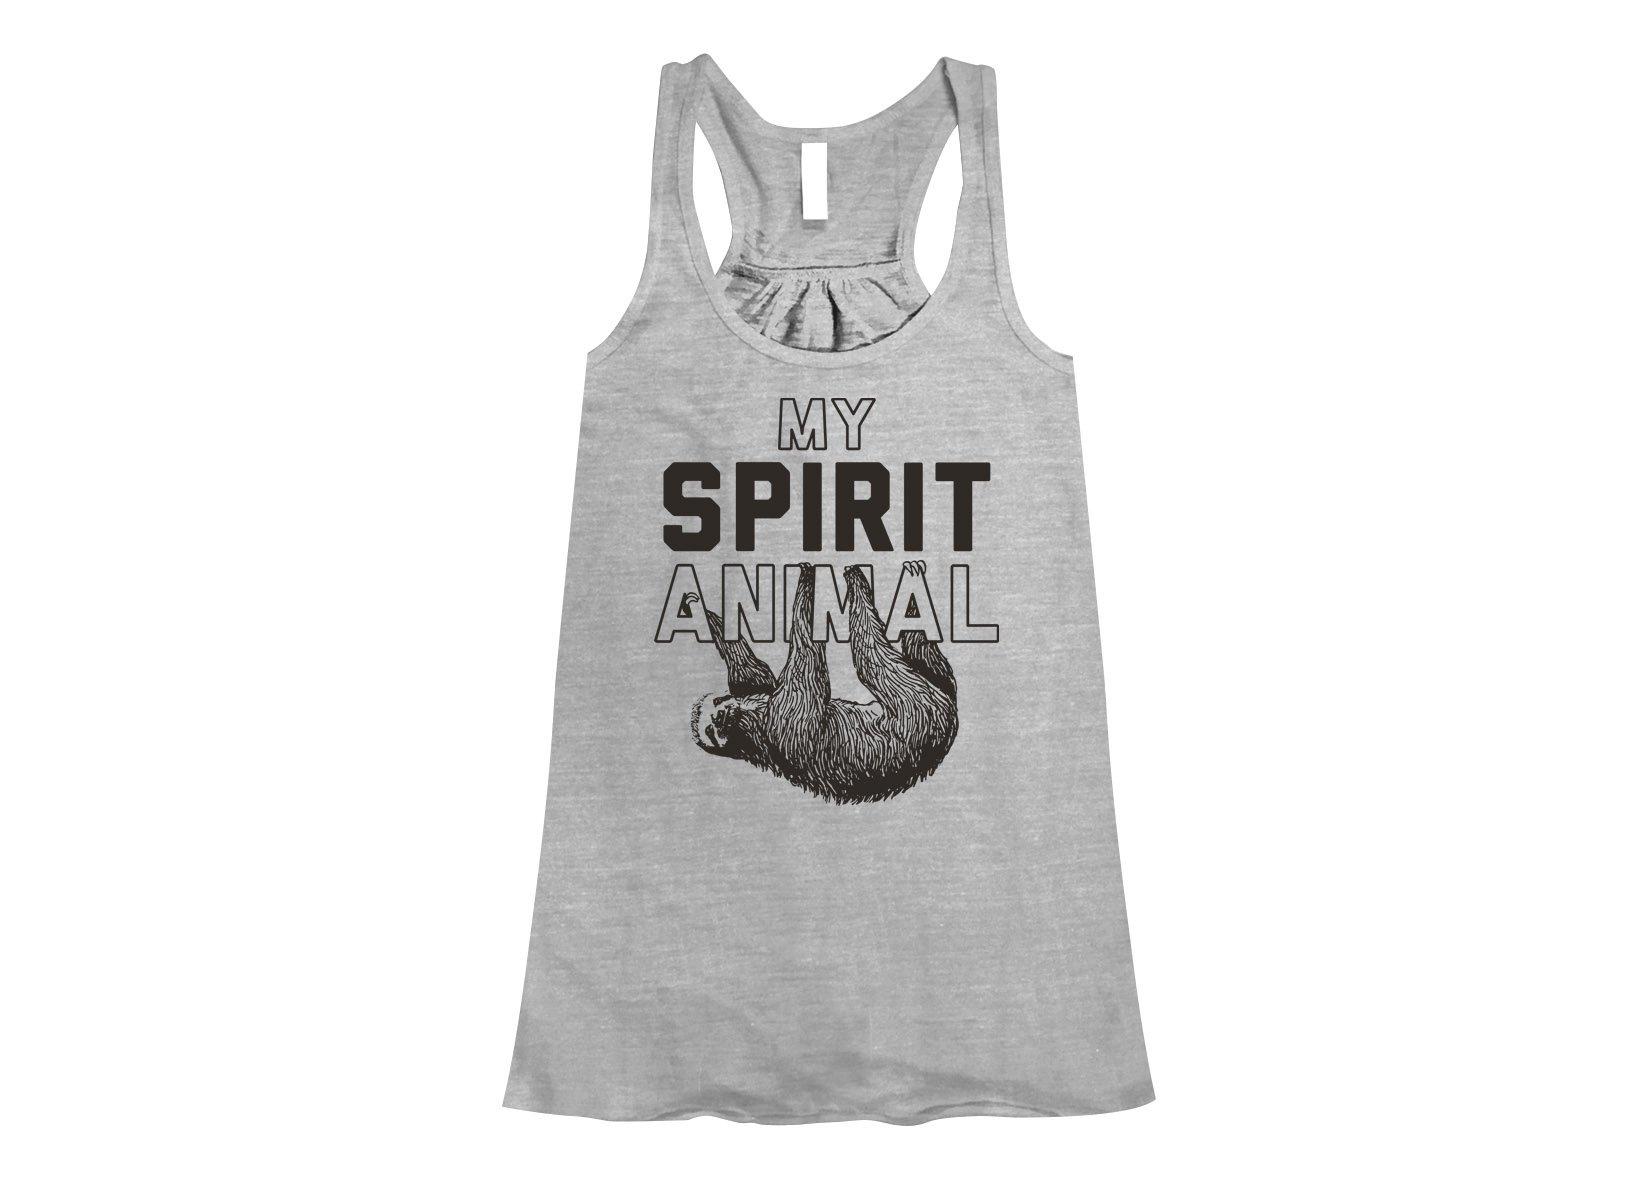 My Spirit Animal on Womens Tanks T-Shirt